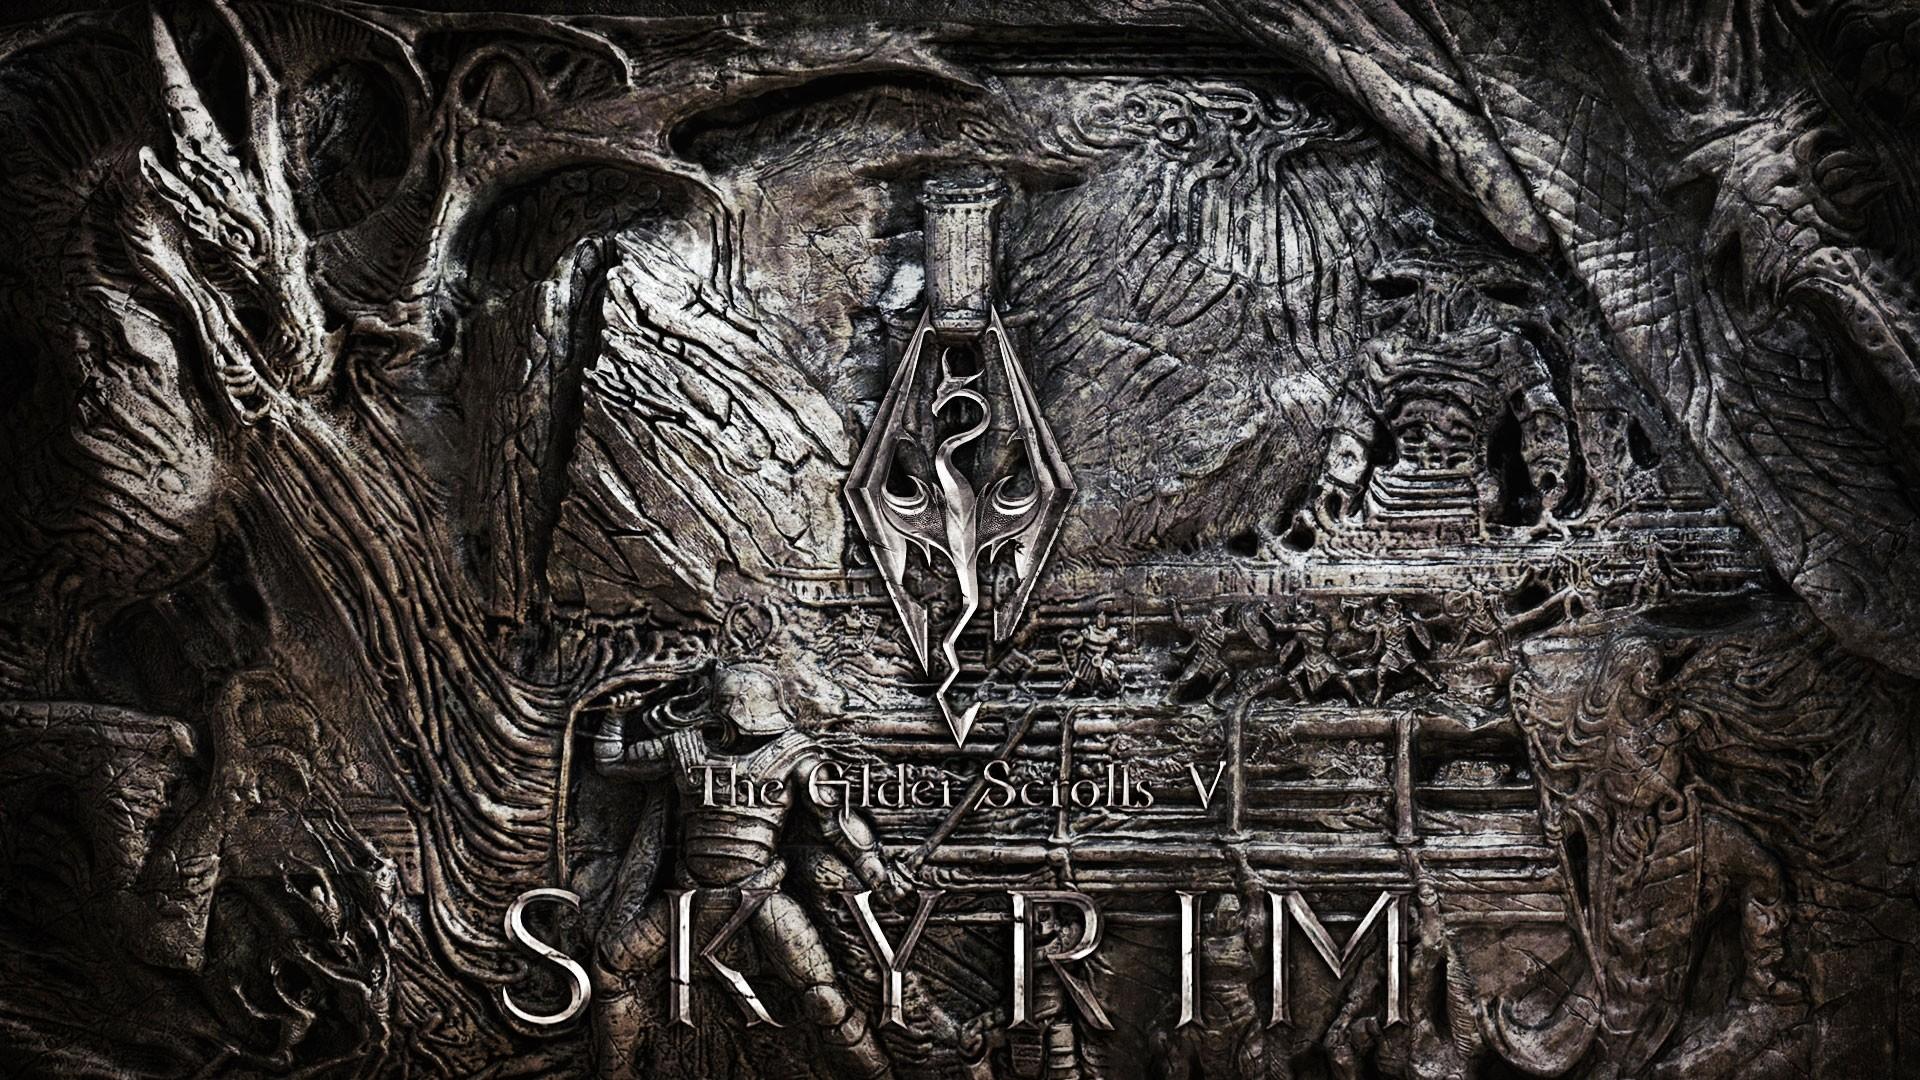 … Background Full HD 1080p. Wallpaper the elder scrolls skyrim,  wall, art, emblem, dragon